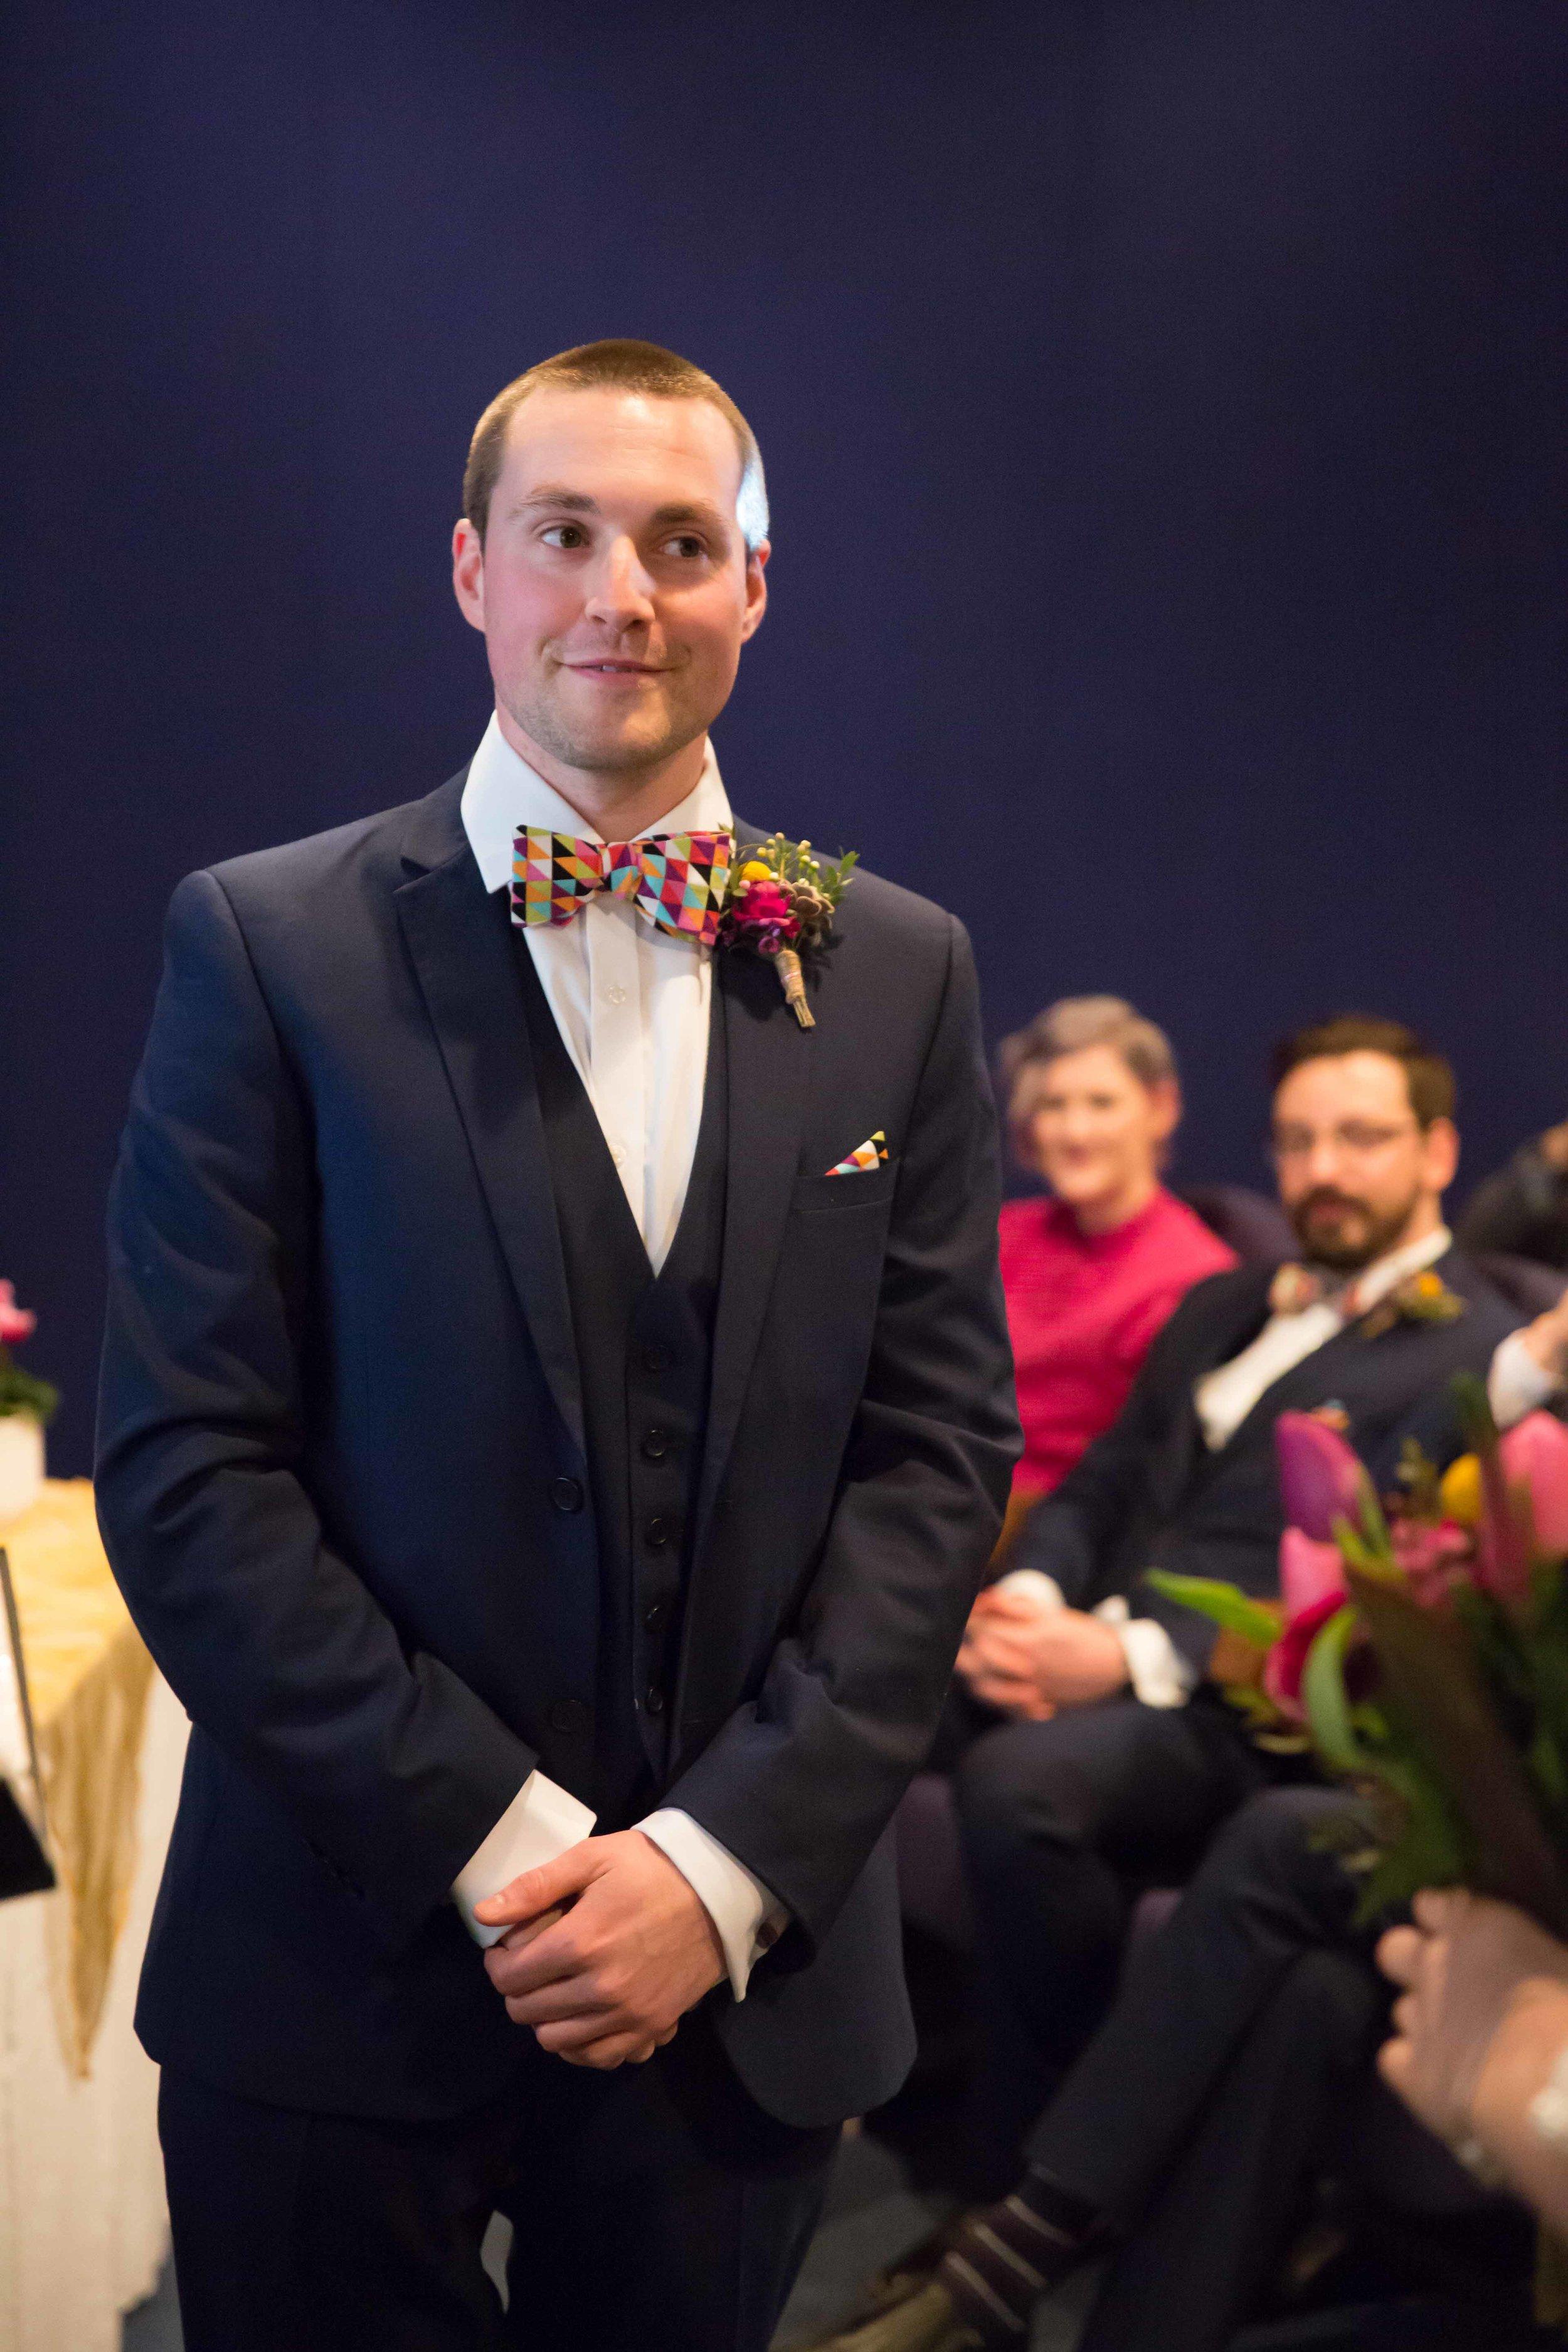 Adam & Faye - Wright Wedding Photography - Bristol Wedding Photographer -94.jpg